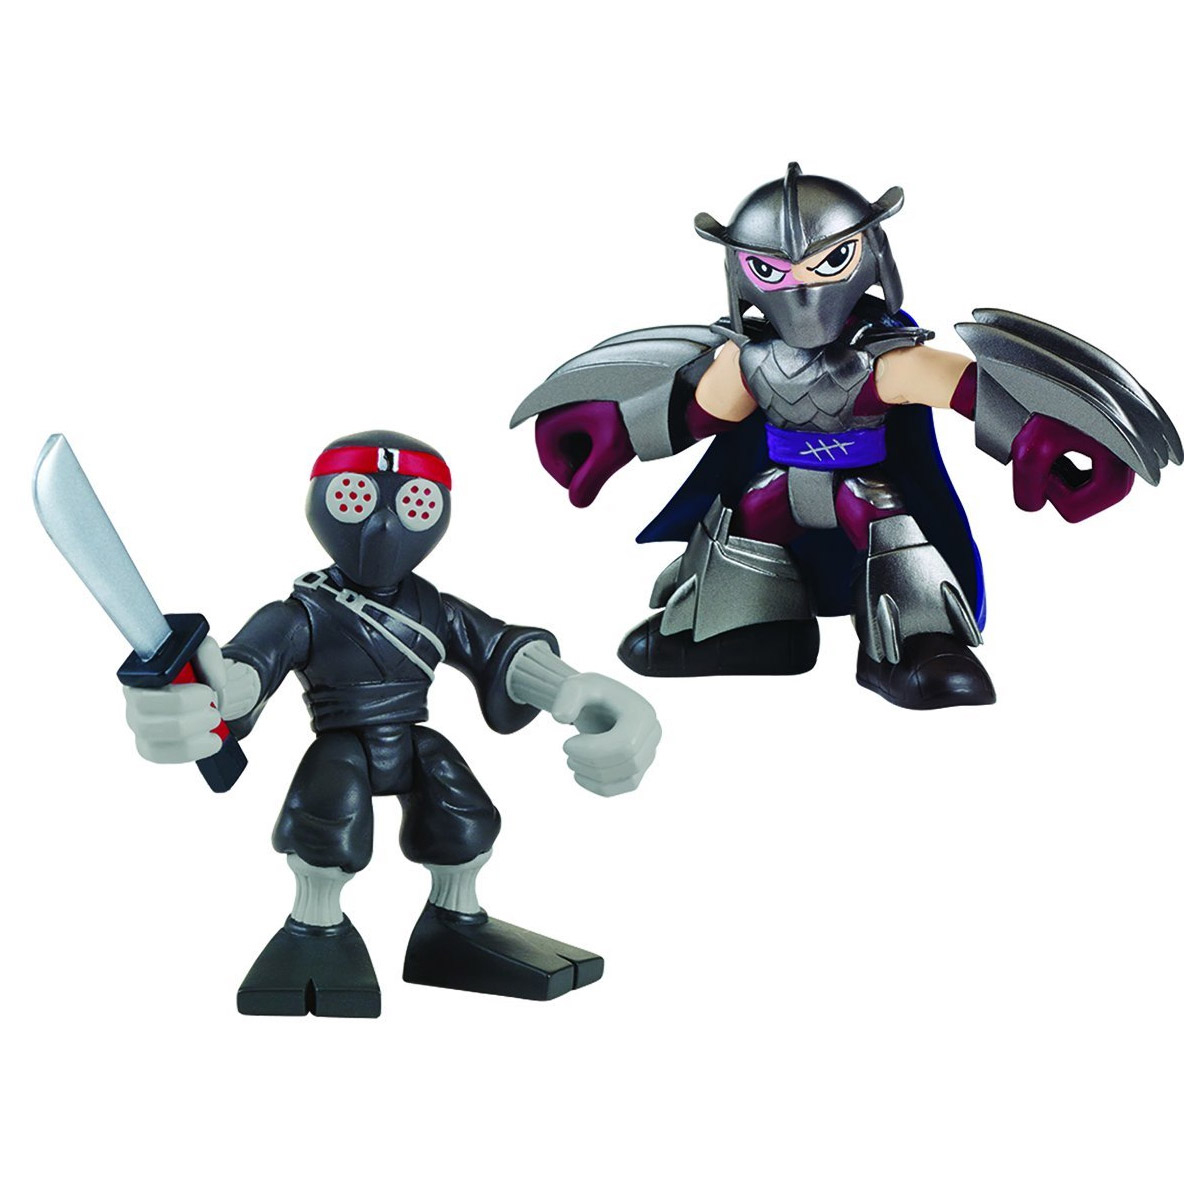 Figurines Tortues Ninja 6 Cm Shredder Et Foot Soldier | Ebay destiné Tortue Ninja Shredder